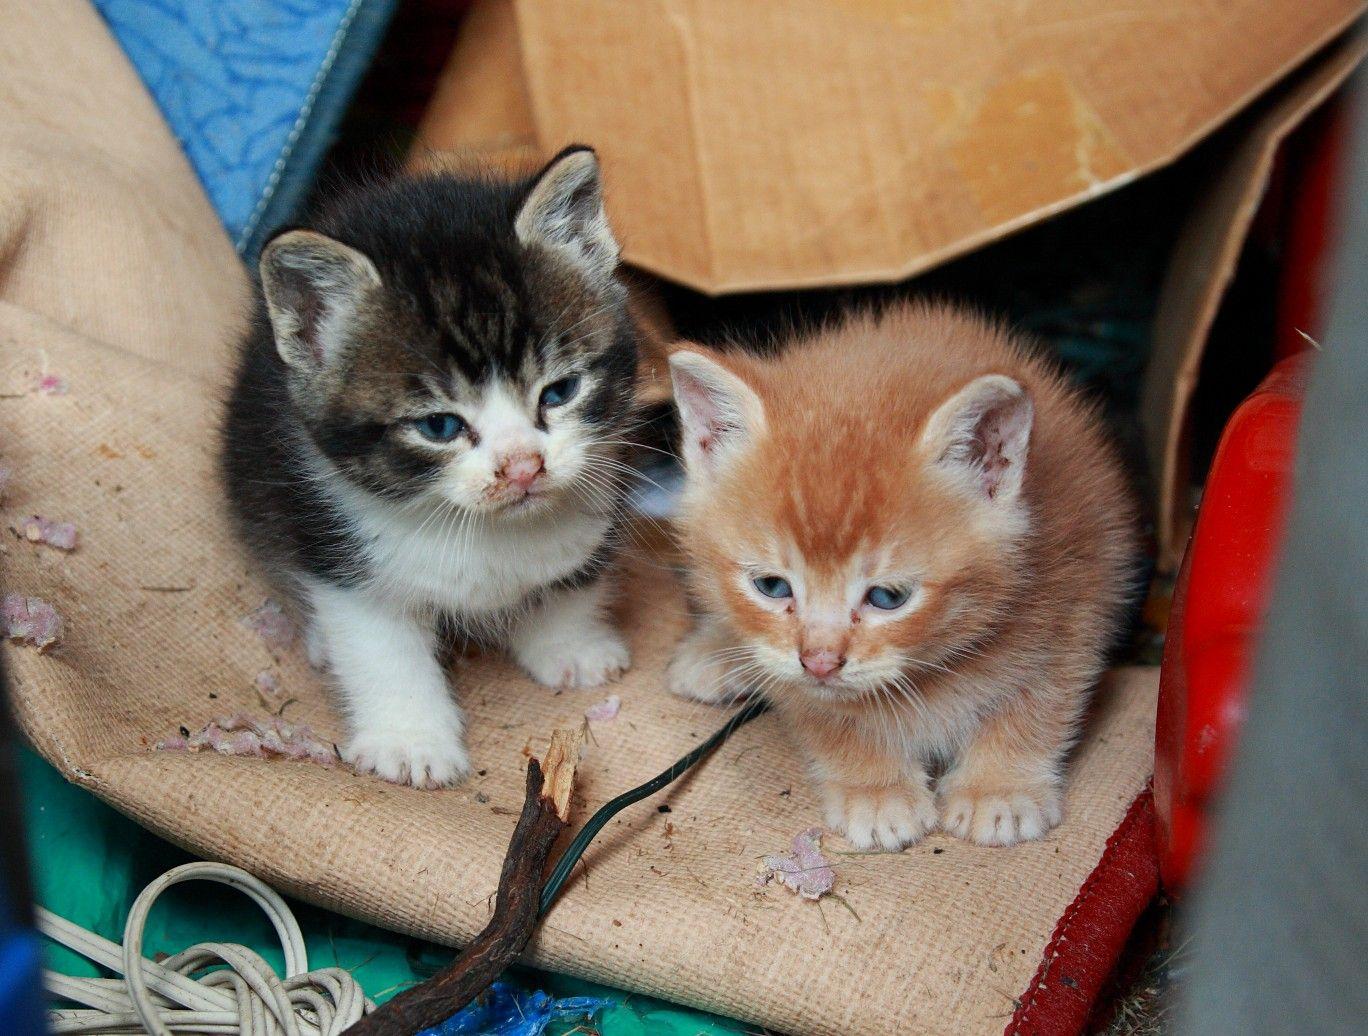 Cat Behavior Home Remedies Cats And Kittens Cat Care Cat Behavior